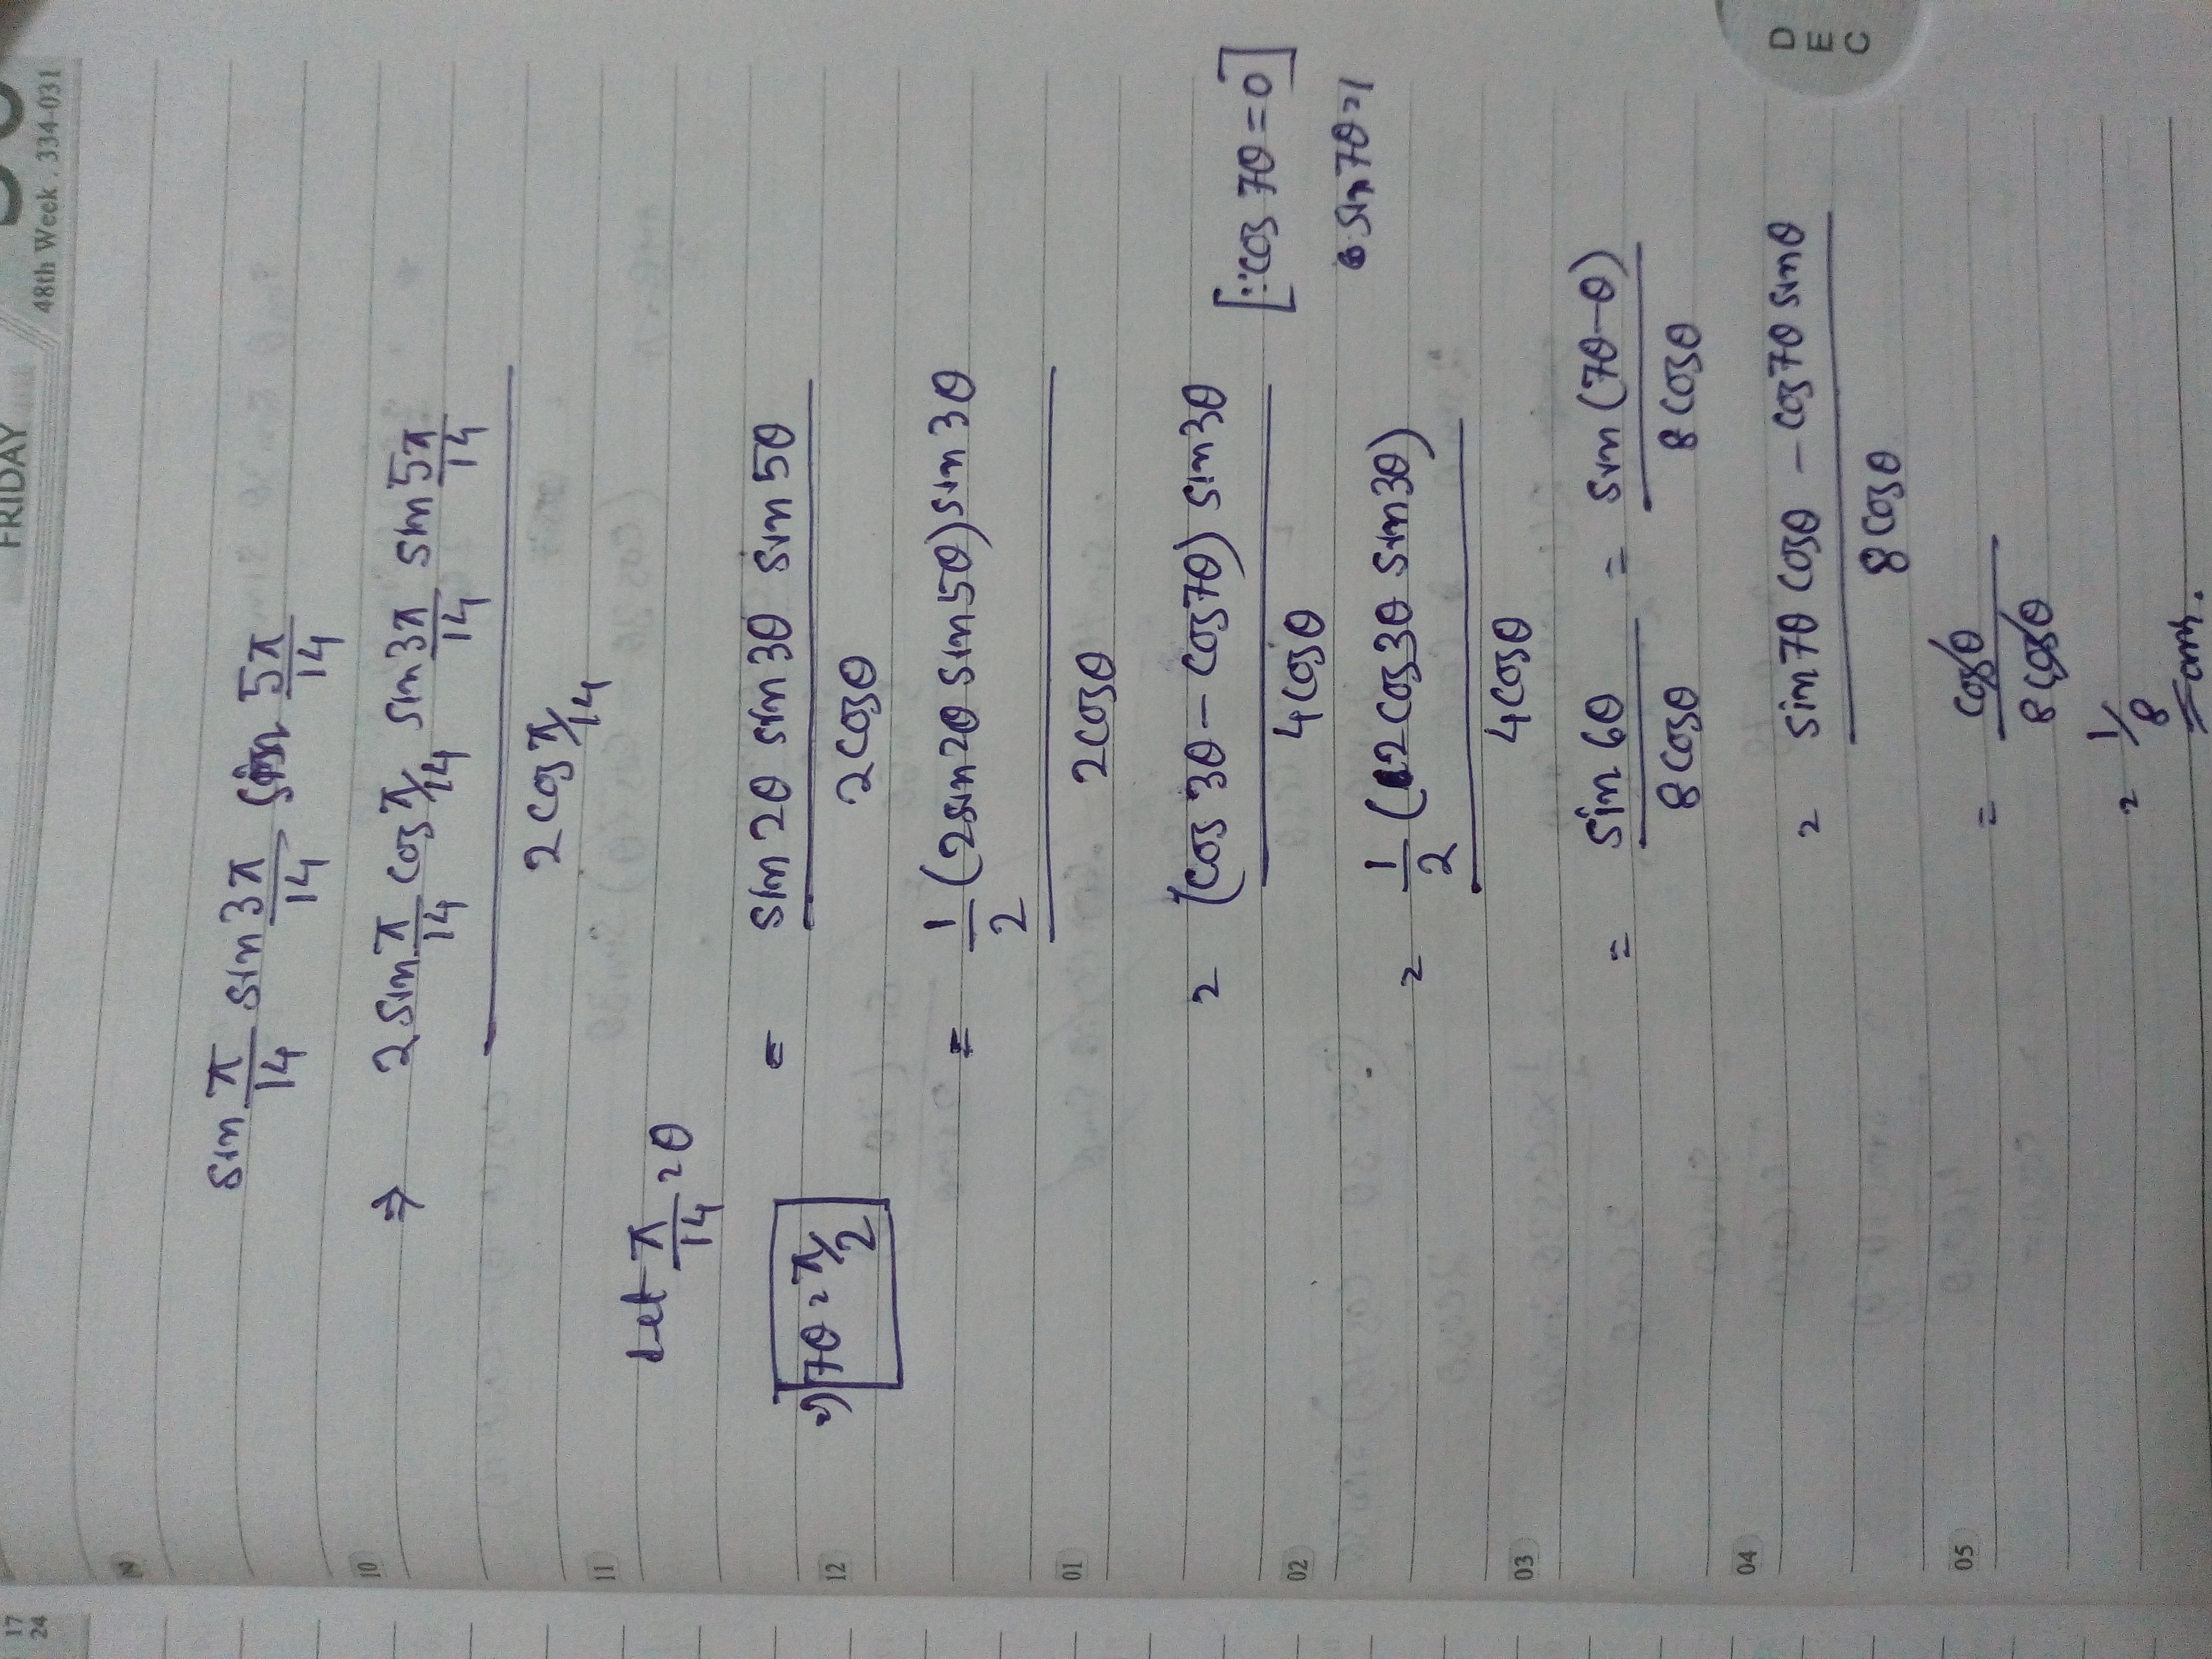 How To Solve Sin P 14 Sin 3p 14 Sin 5p 14 Quora